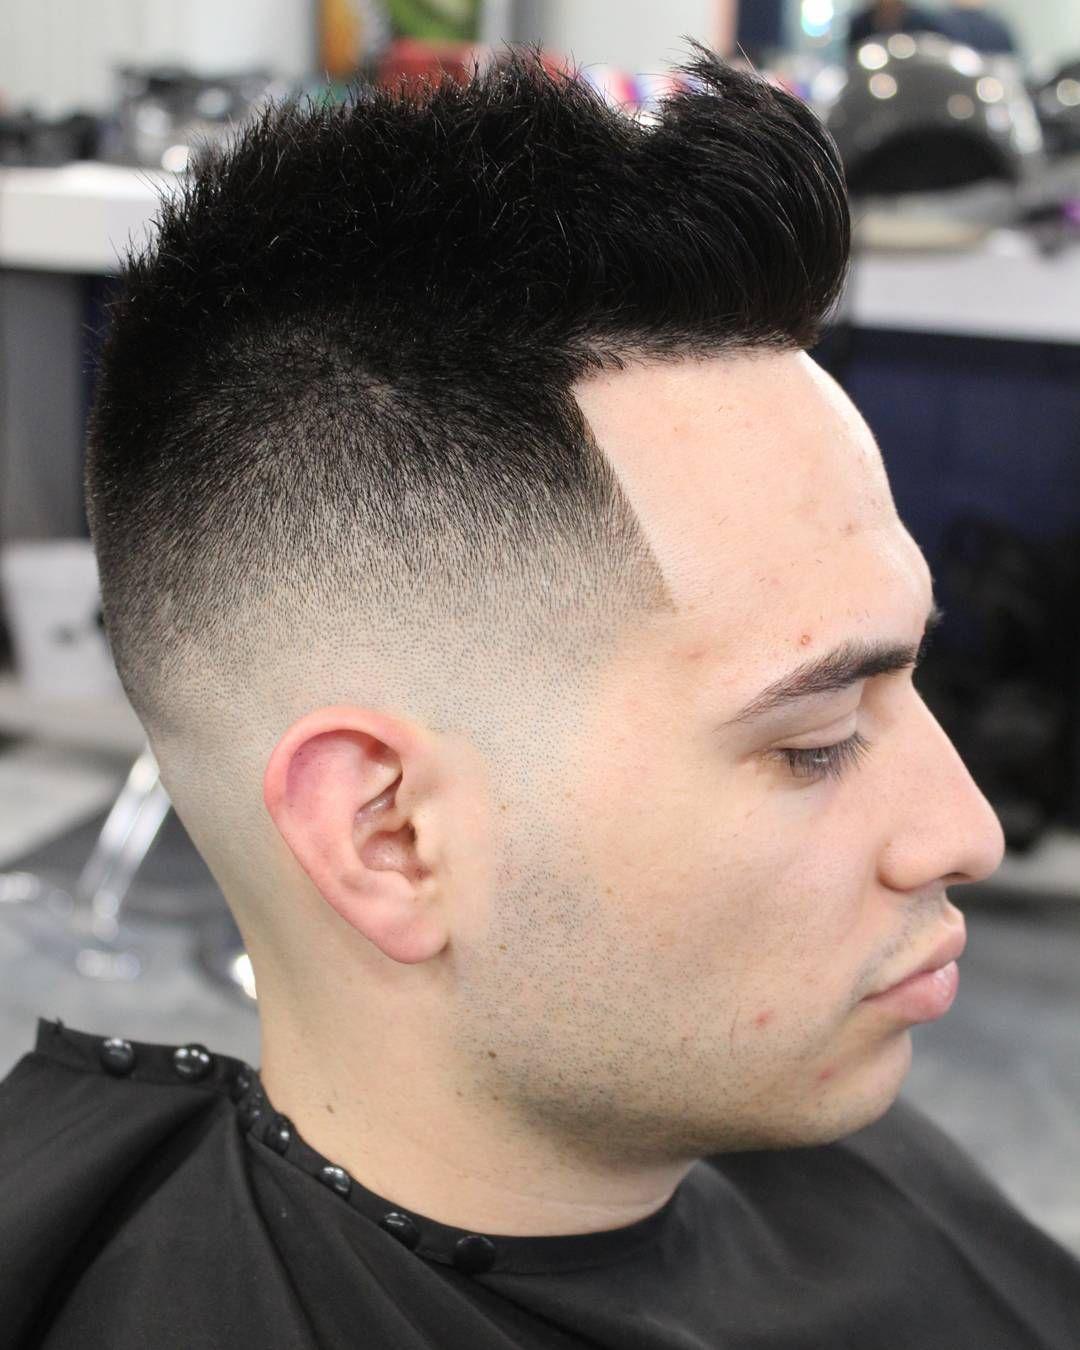 Haircut By O T The Barber Mjbarberstudio 1651 N Zaragoza El Paso